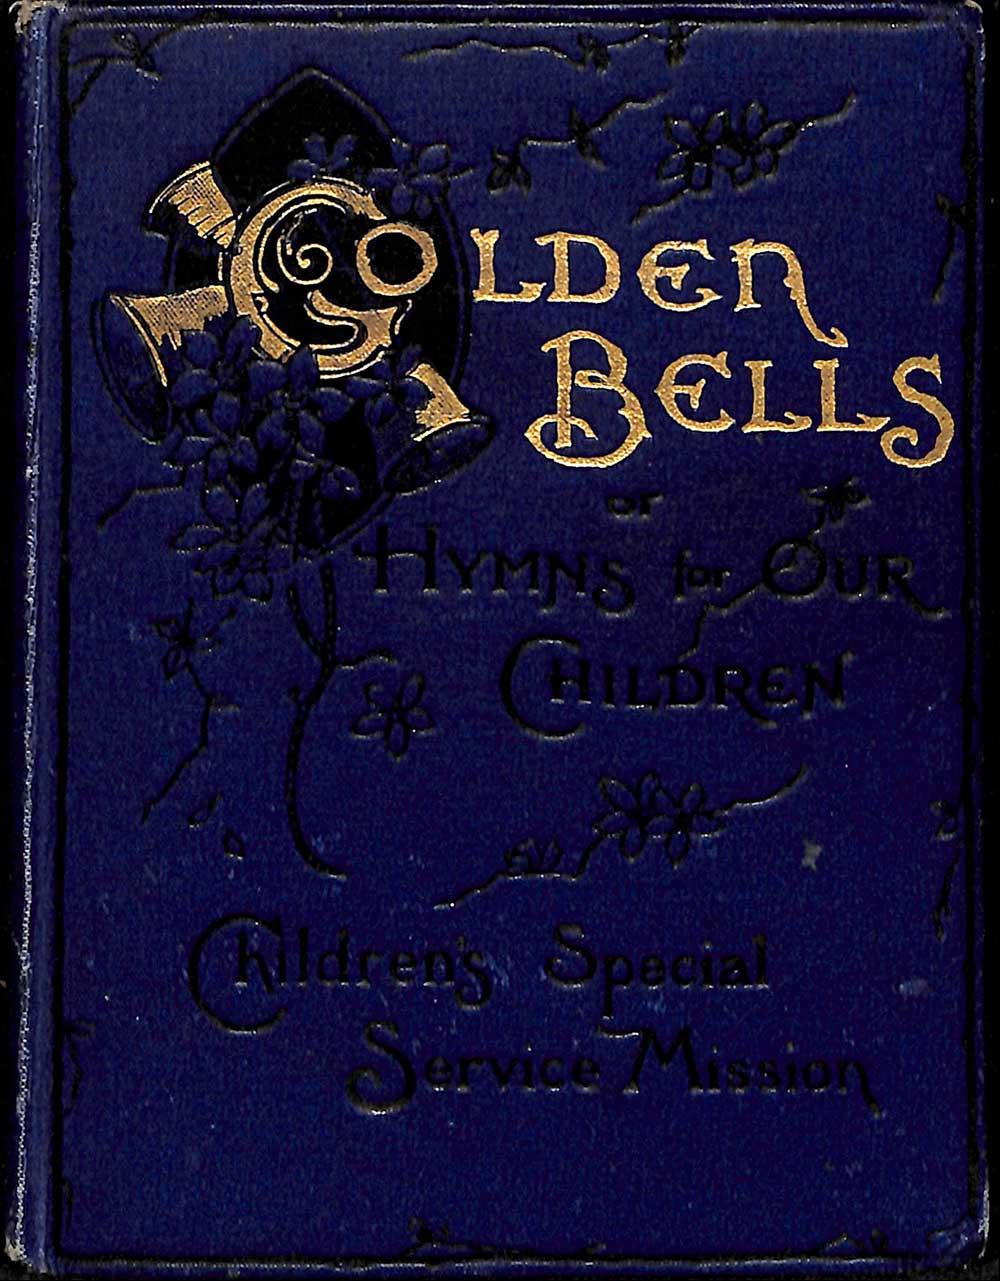 Children's Special Service Mission. <em>Golden bells, or, Hymns for our children.</em> 27th edition. London: CSSM, [1913?]